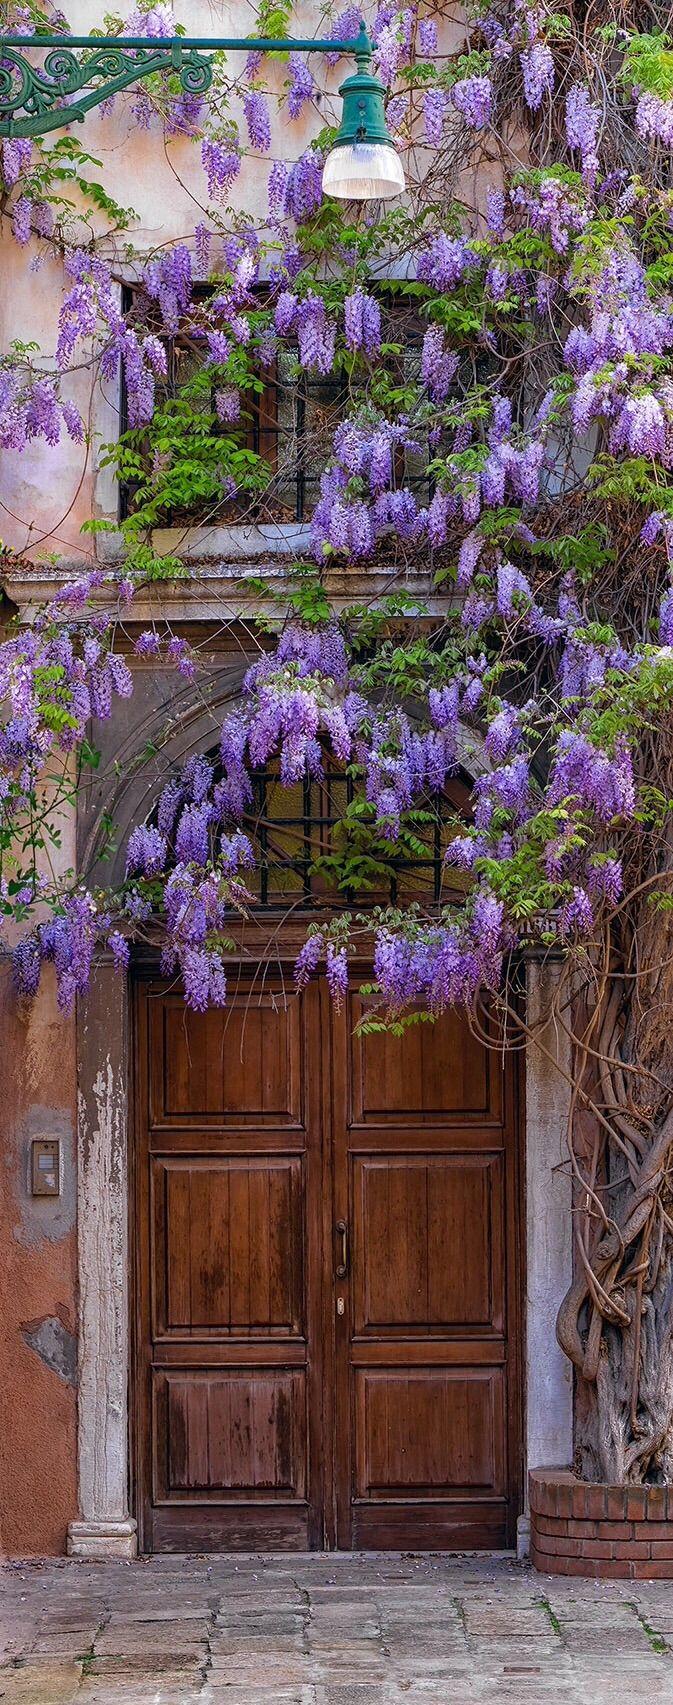 Venice, Italy | Peter Lik Photography